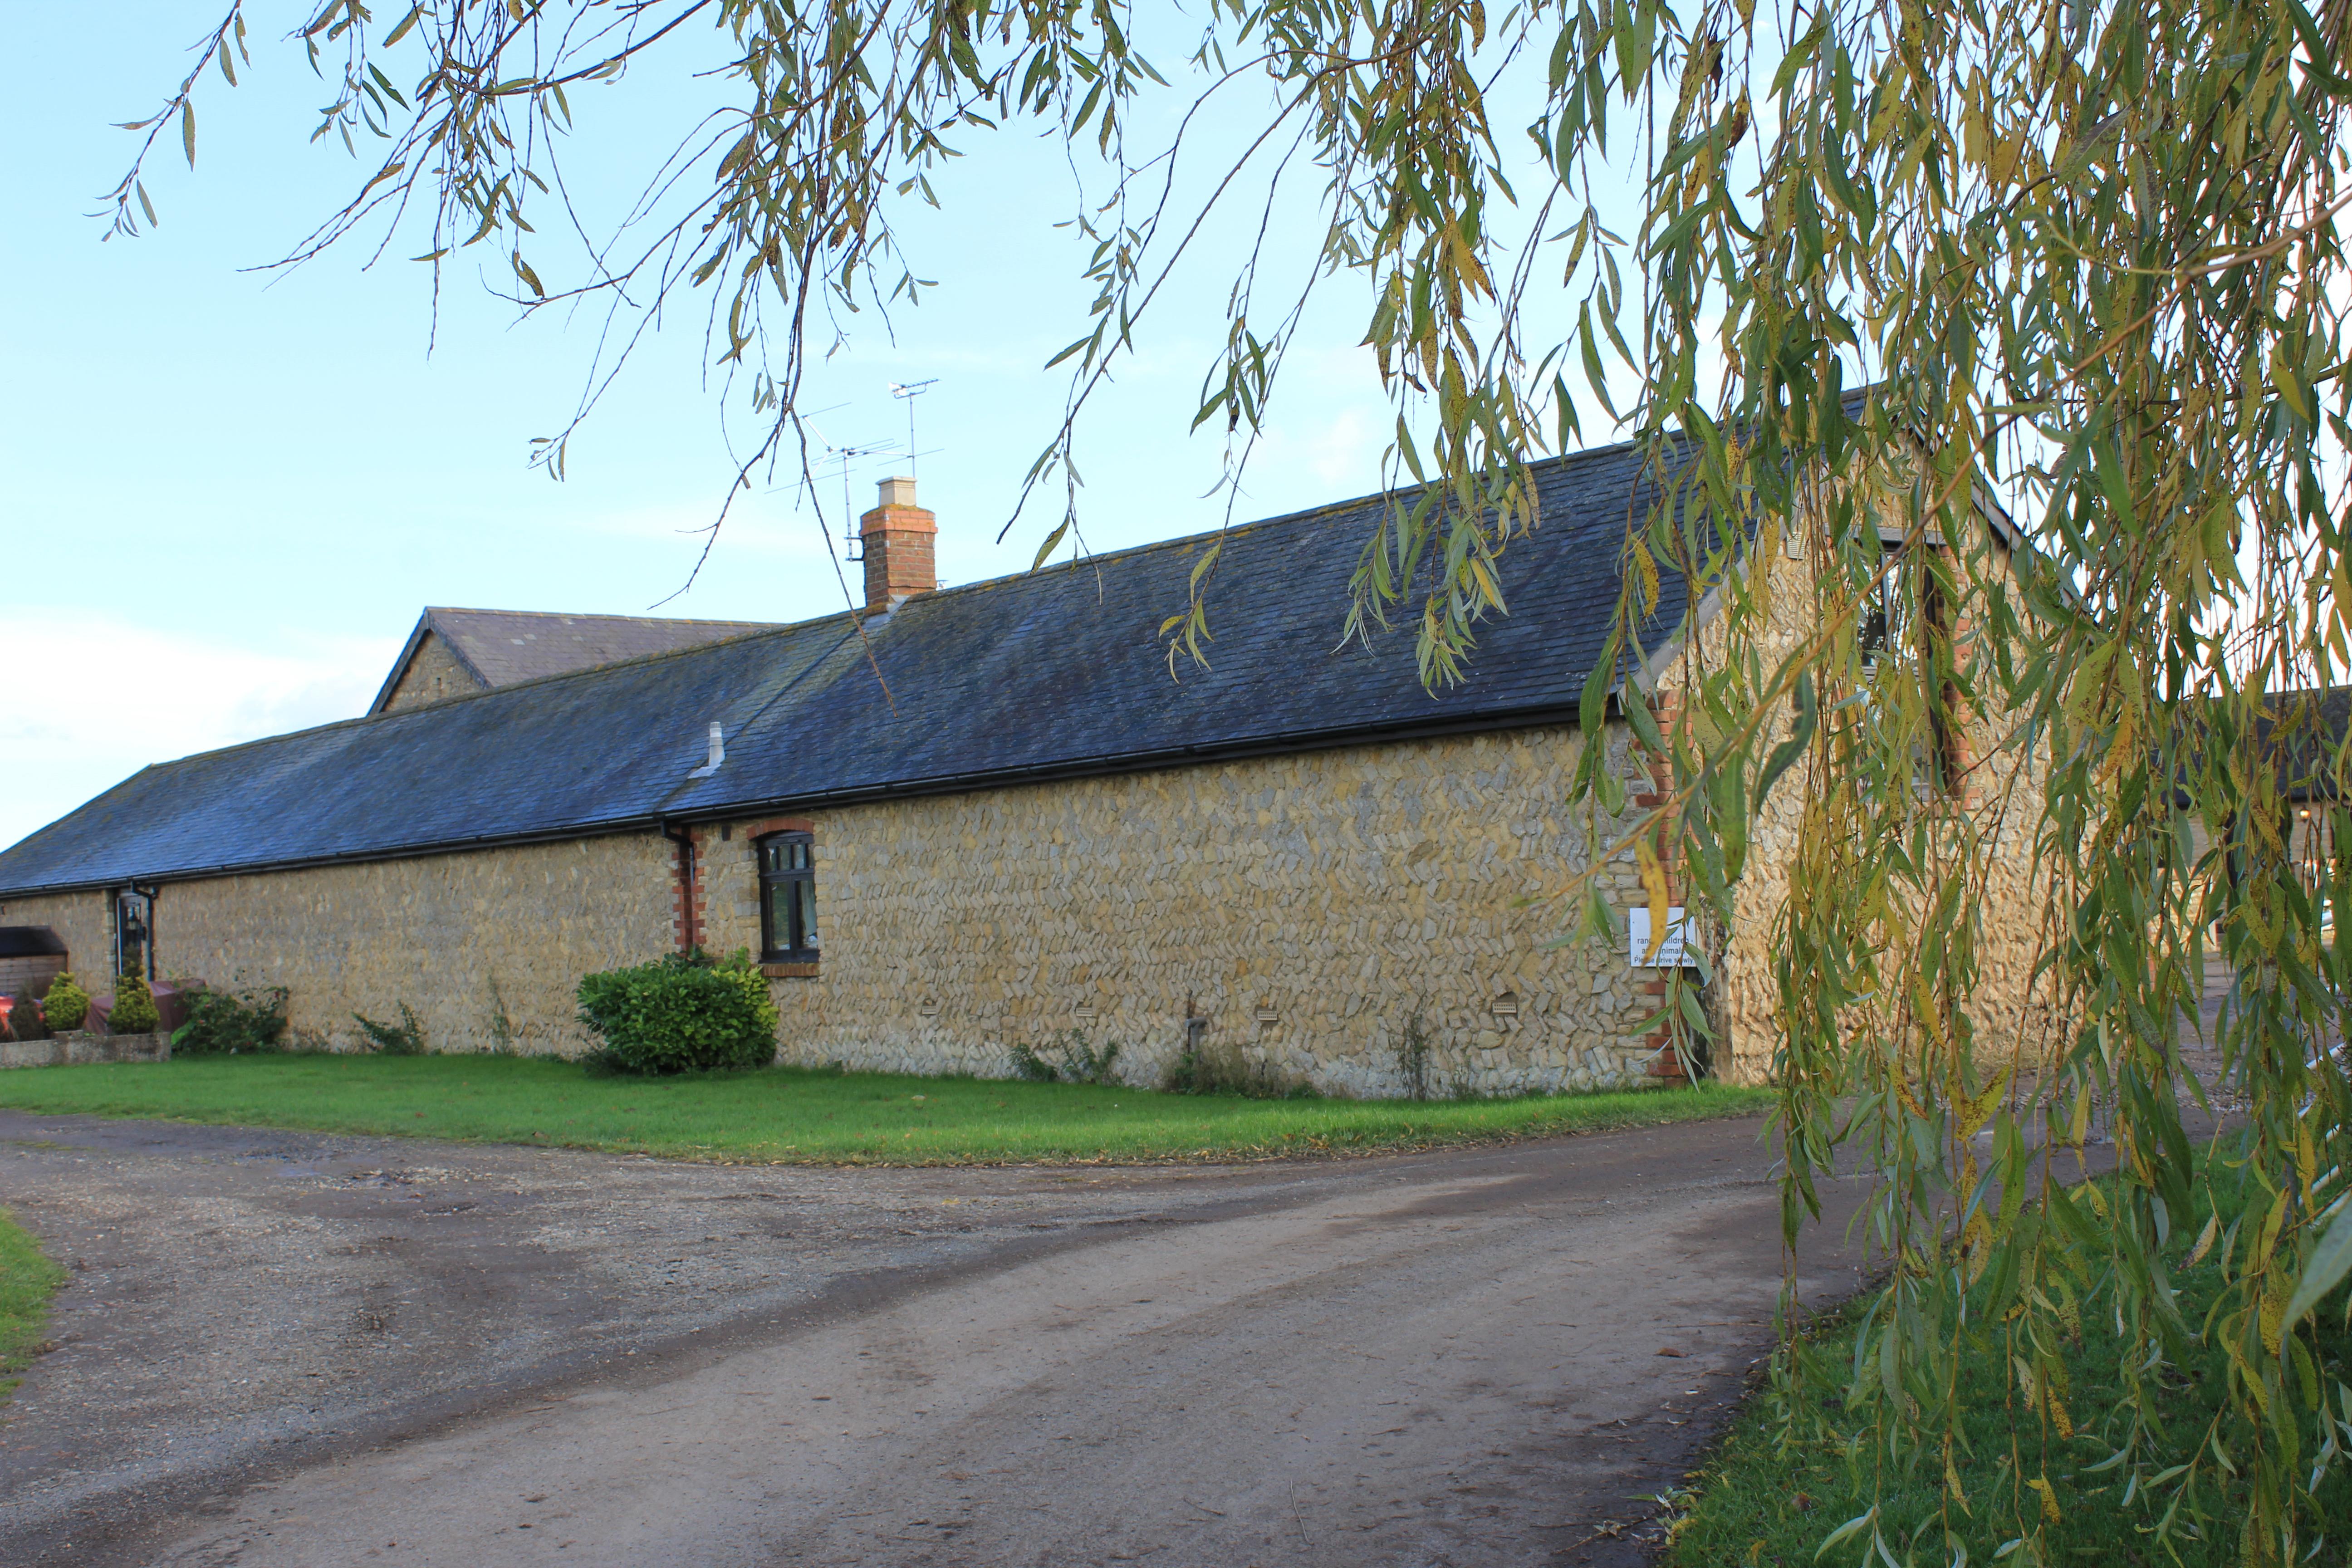 Forest Road, Milton Keynes, Buckinghamshire Image